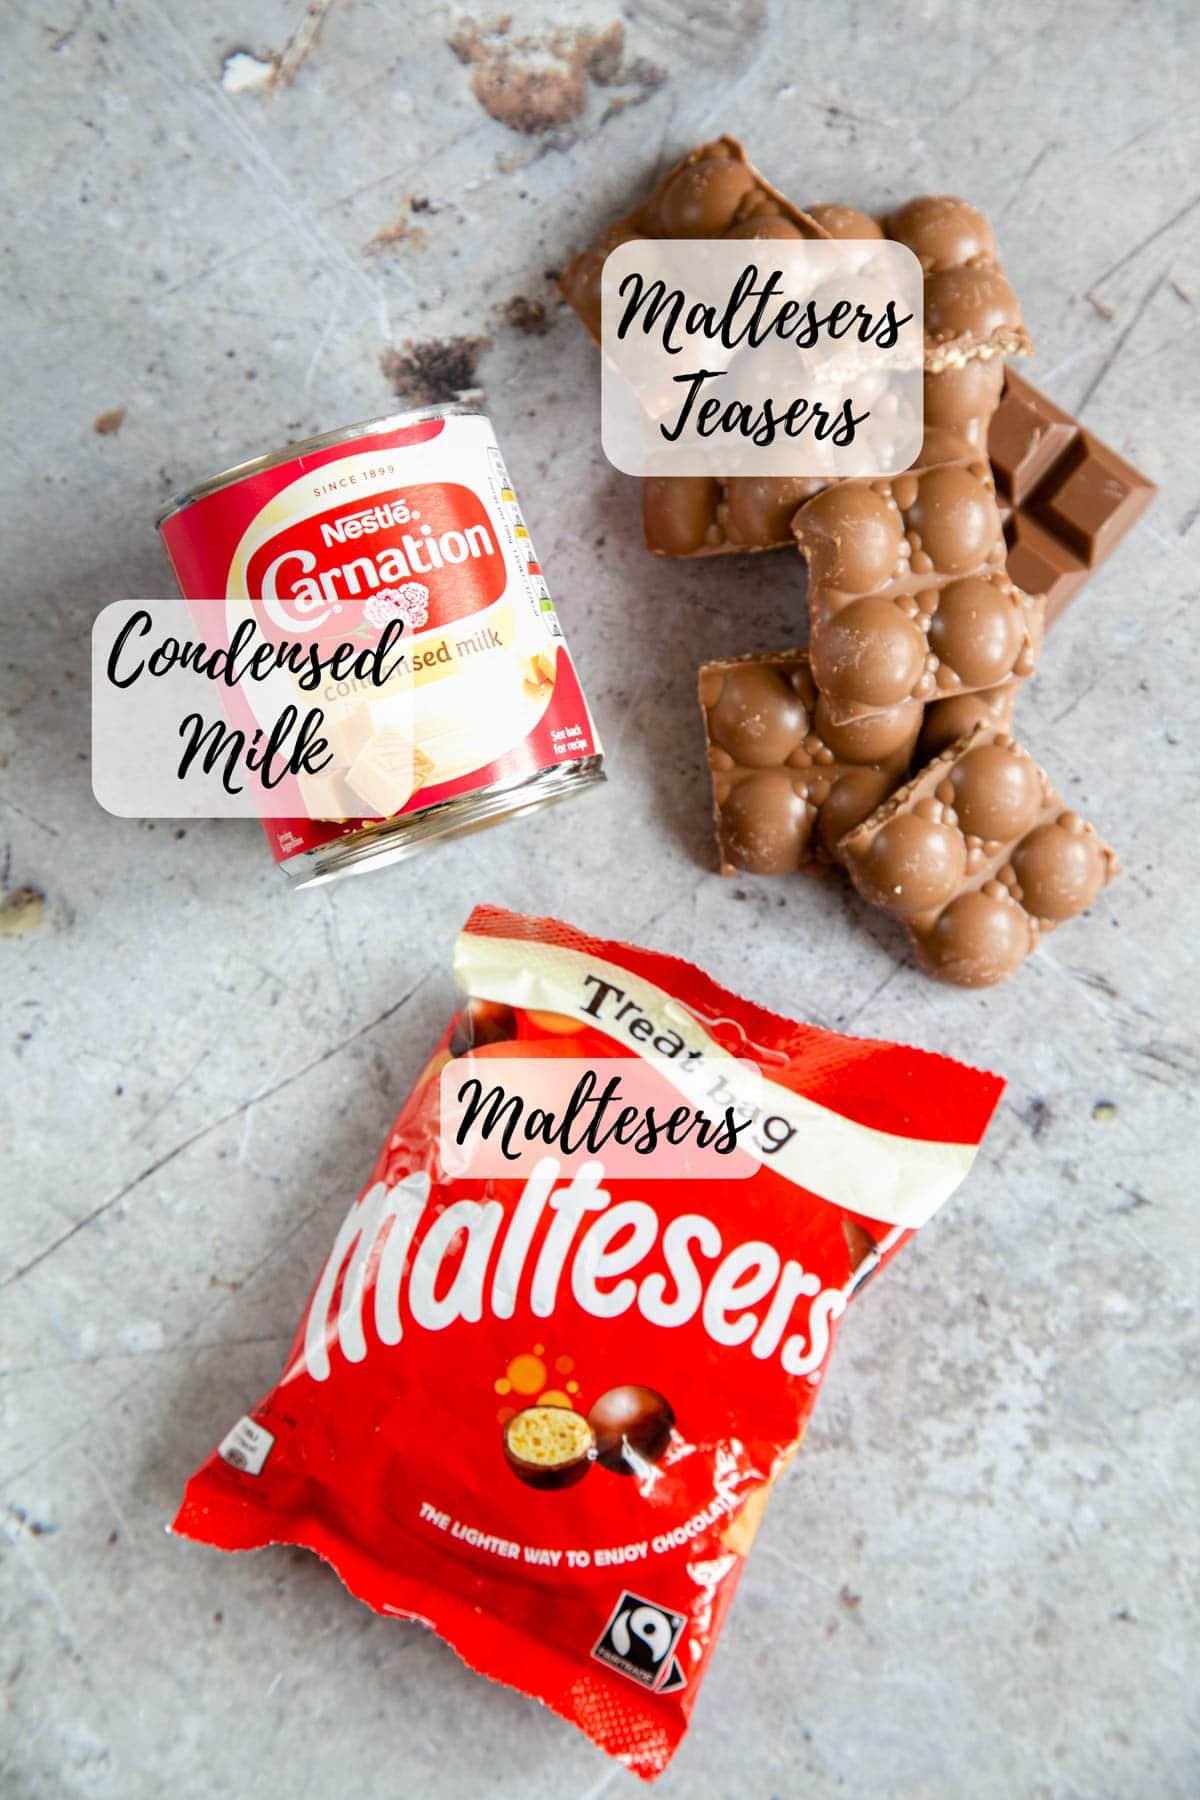 Ingredients for the fudge - Maltesers, Malteser teasers, and condensed milk.